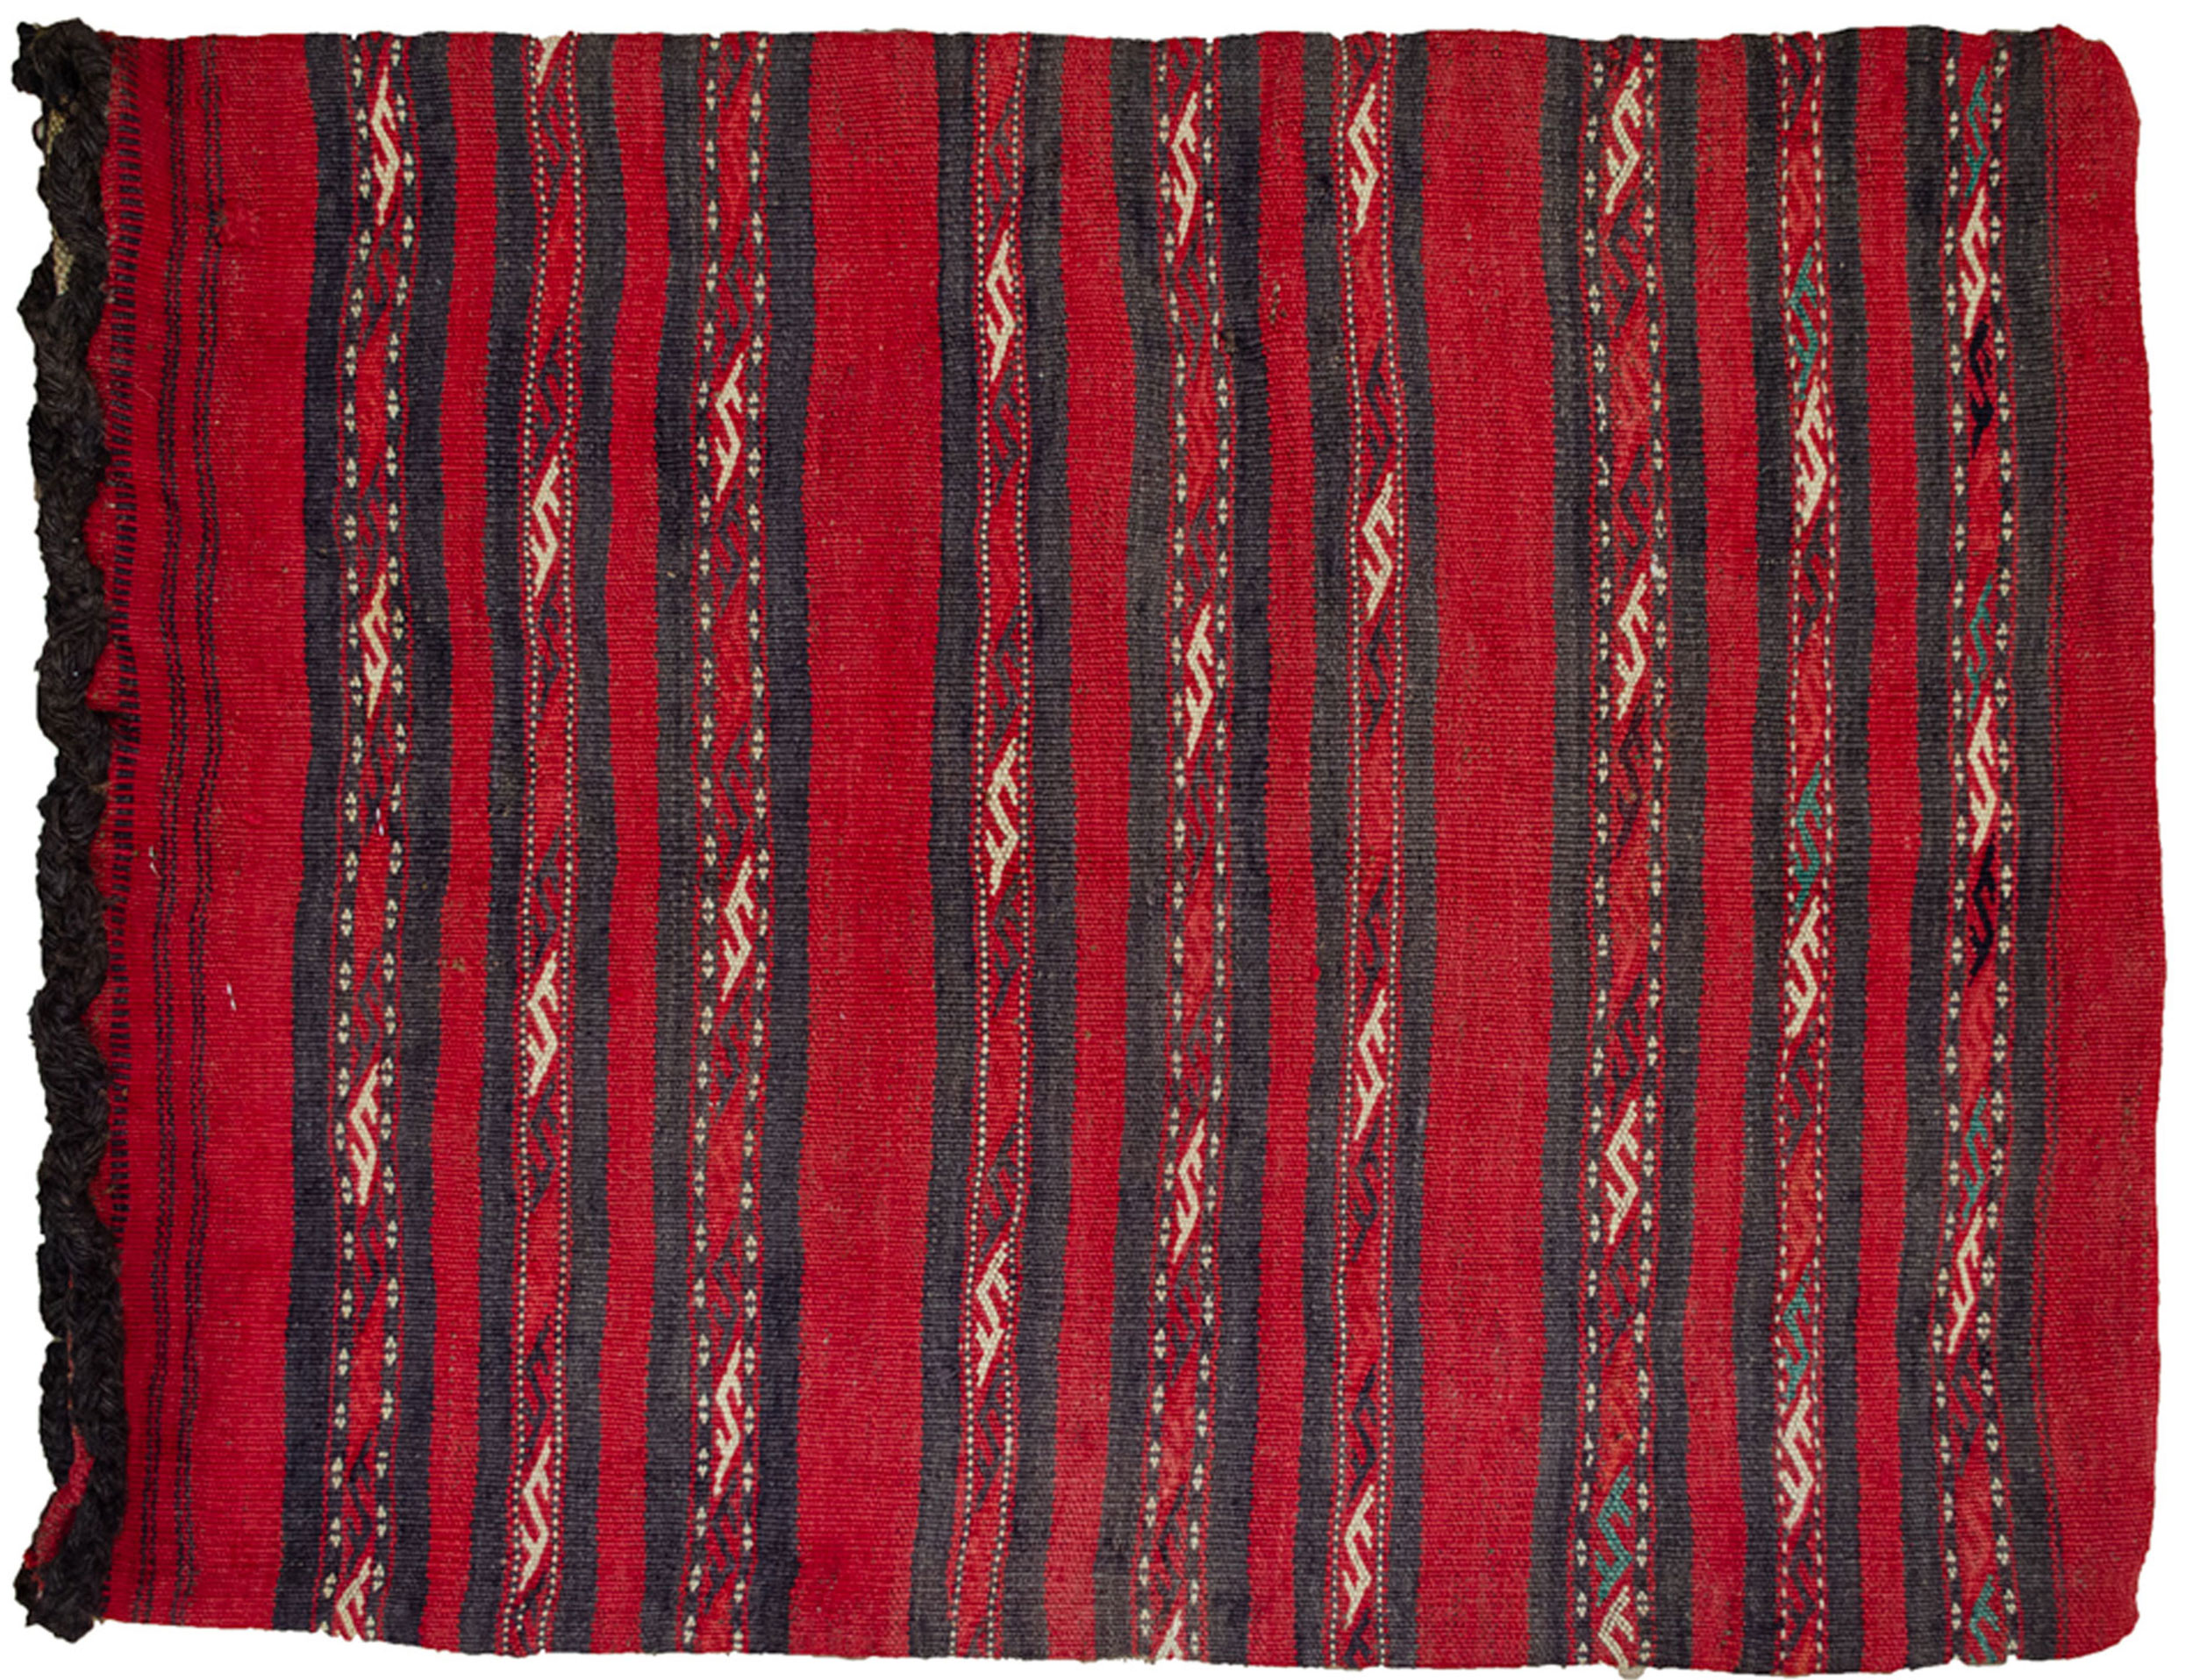 Vintage Turkman Tobreh Bag 84x65cm